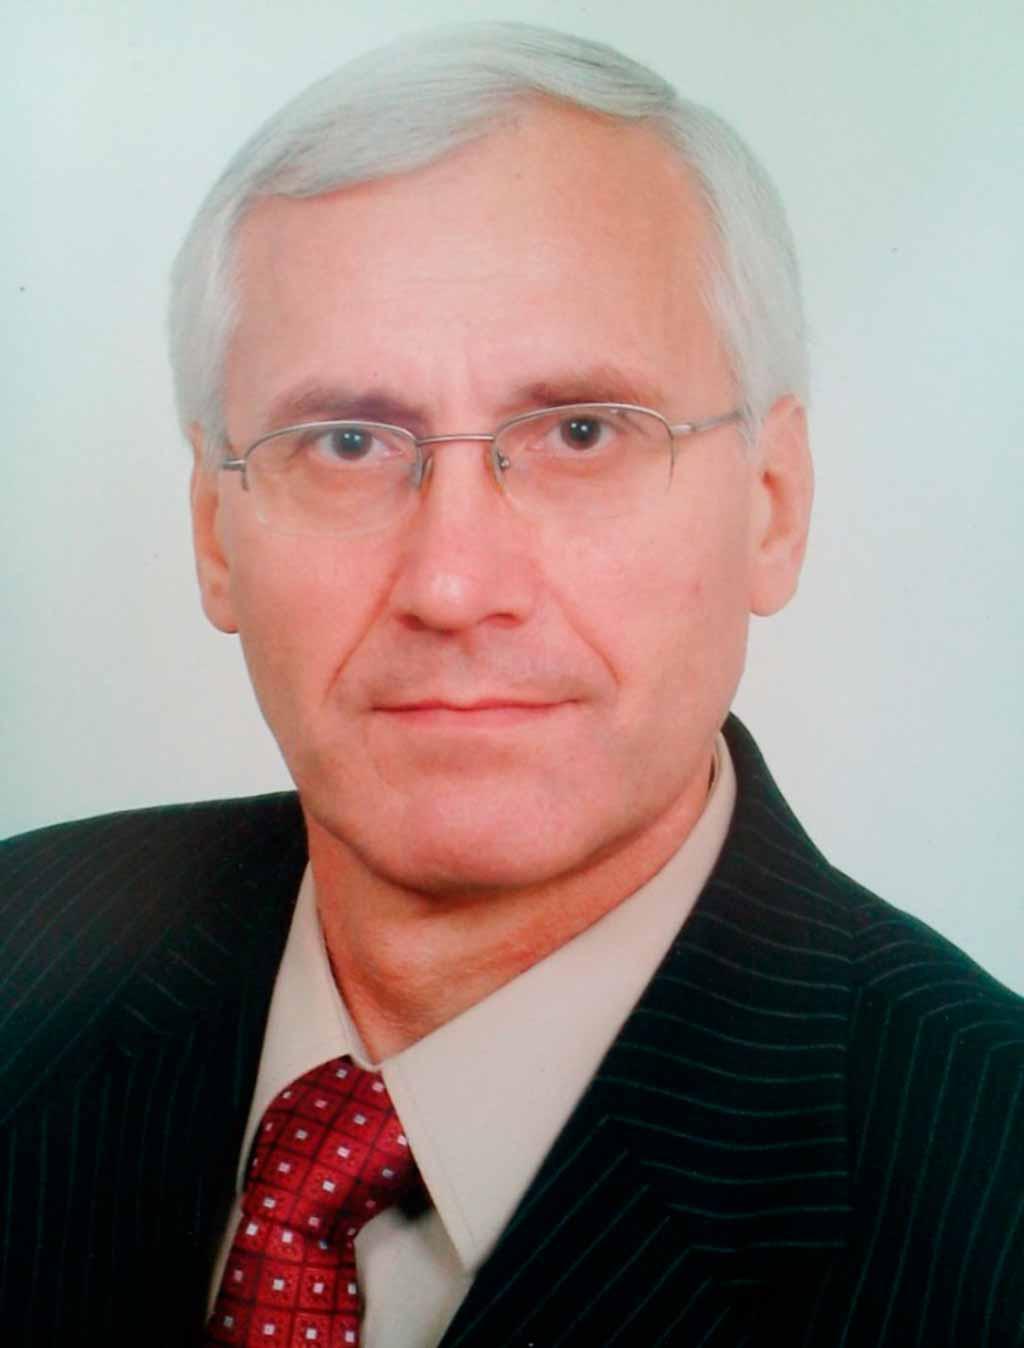 Шиян Анатолій Григорович – старший викладач кафедри.